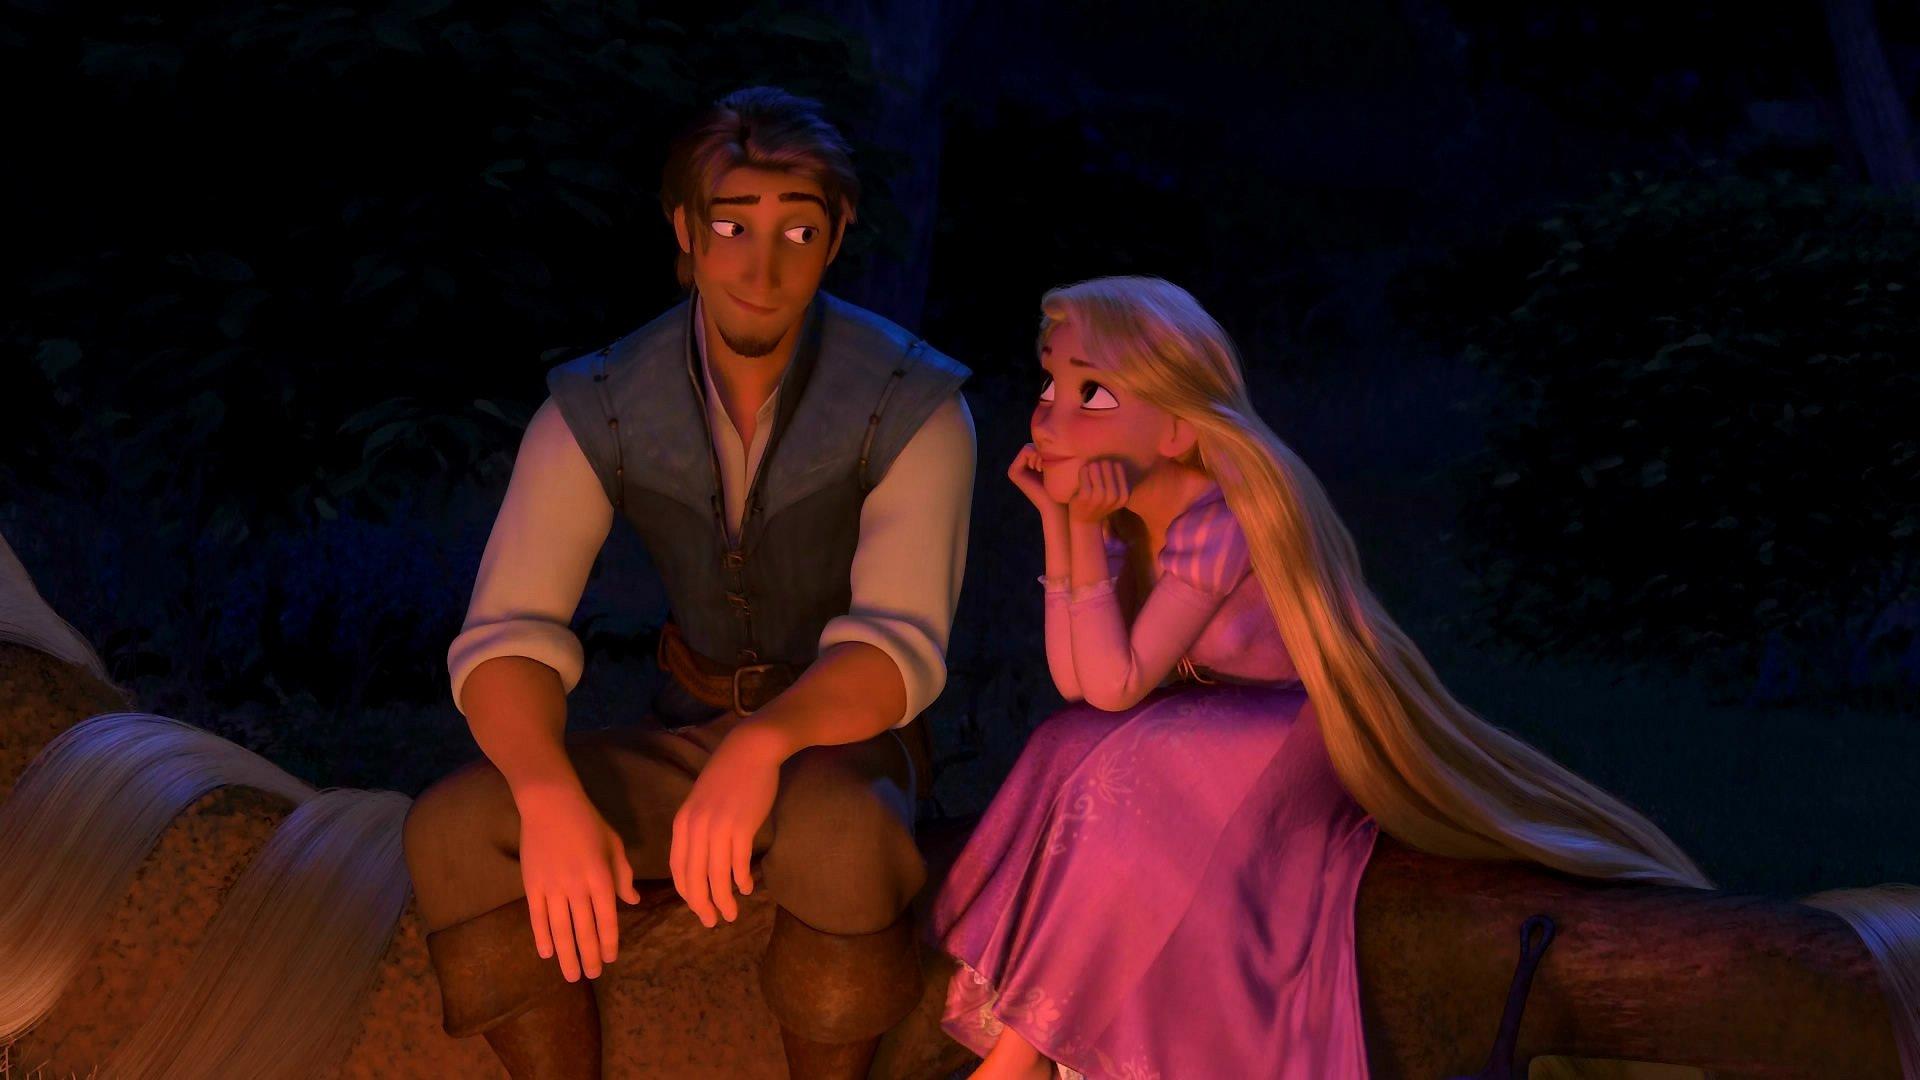 Tangled Rapunzel And Flynn Rider